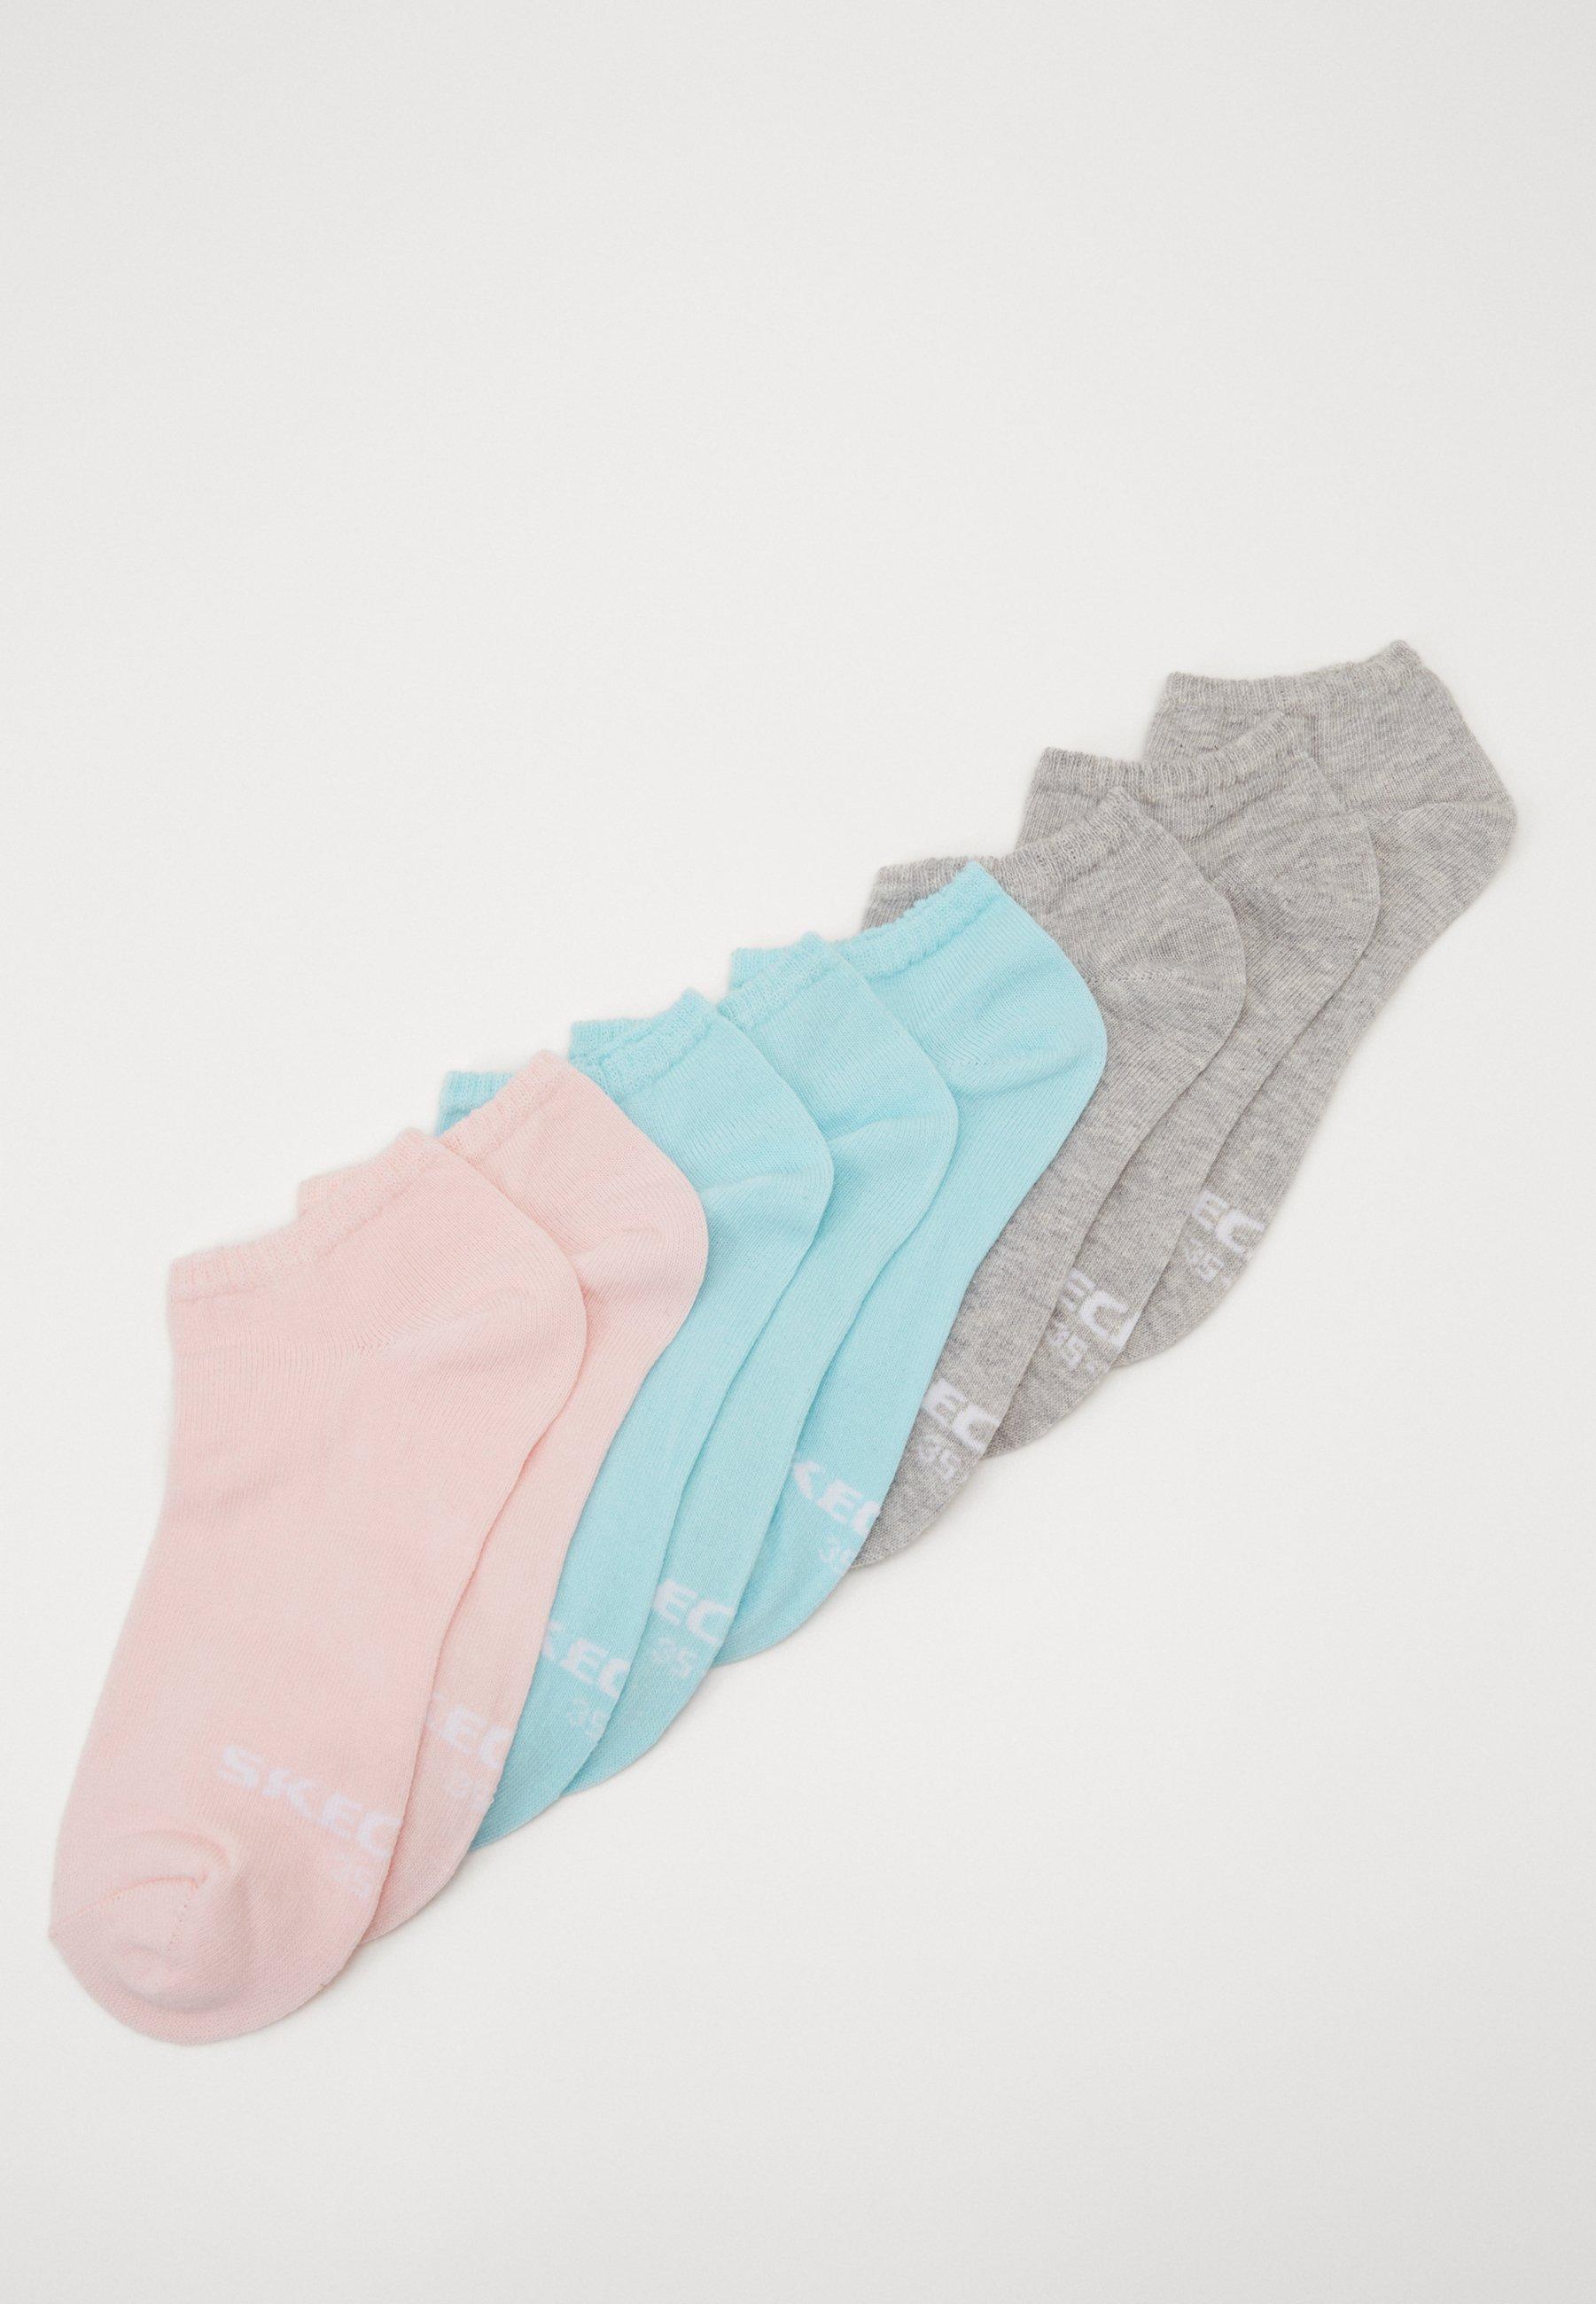 Femme ONLINE CASUAL WOMEN BASIC SNEAKER 8 PACK - Chaussettes